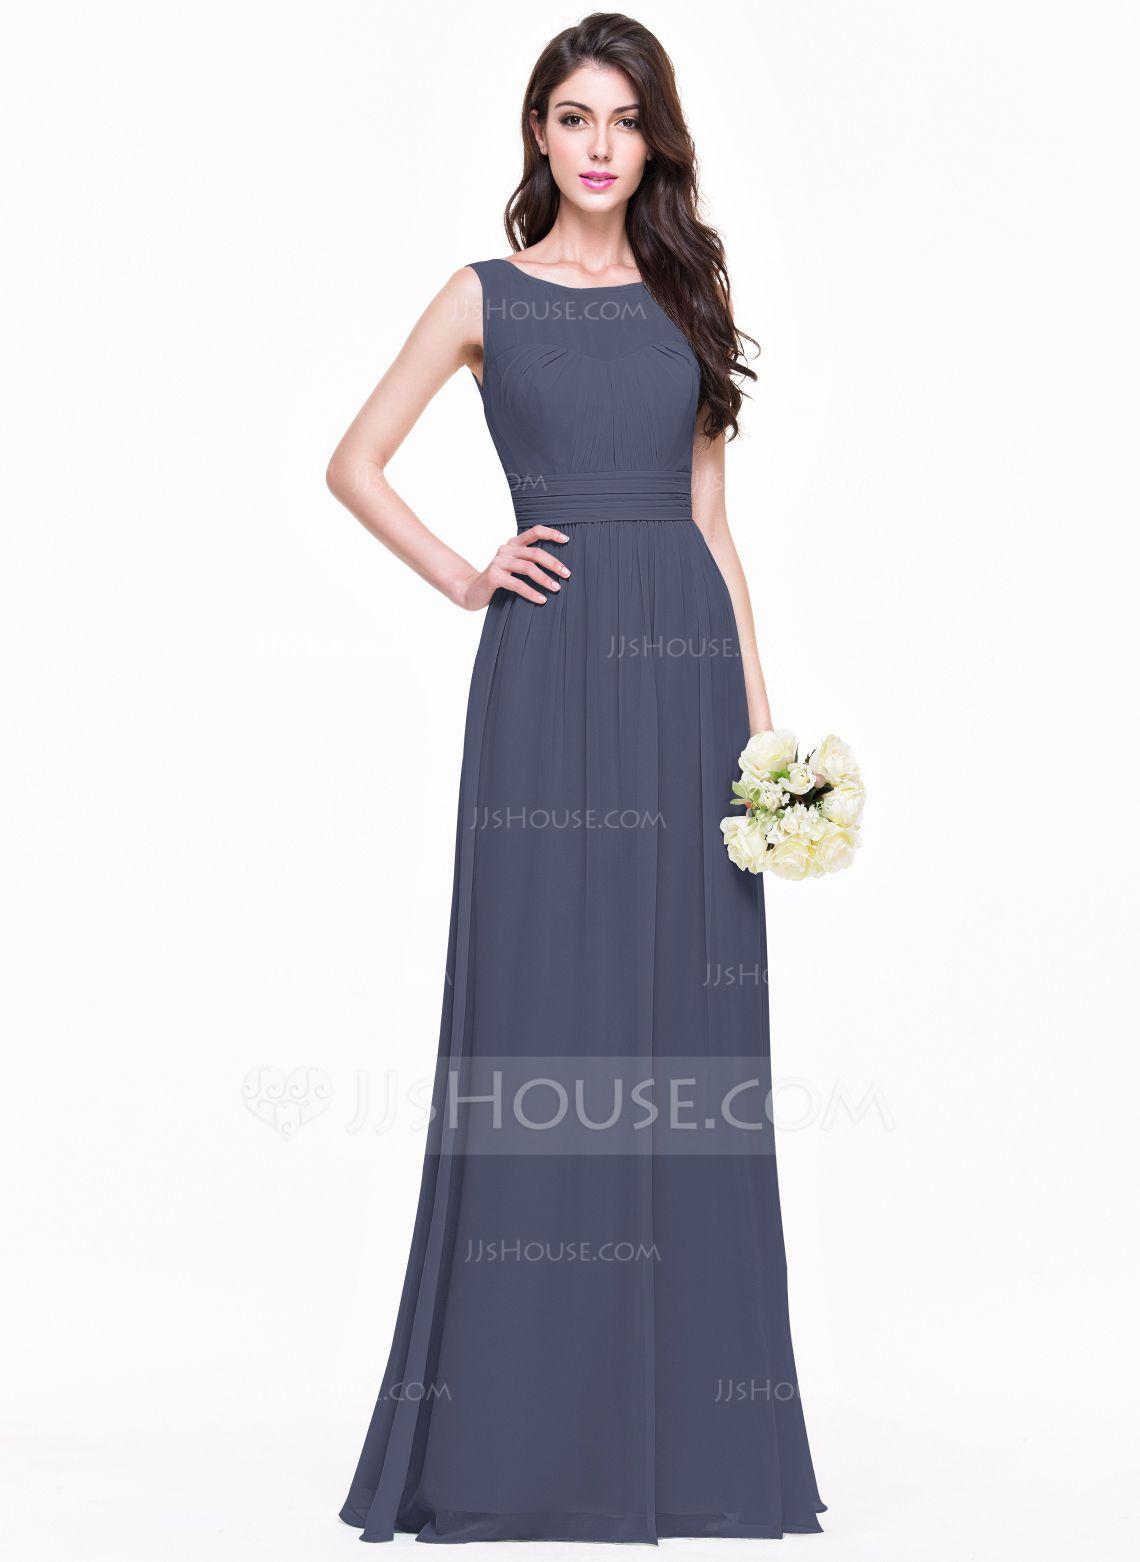 803c28a84d6a A-Line/Princess Scoop Neck Floor-Length Chiffon Bridesmaid Dress With Ruffle  (007068368) - Bridesmaid Dresses - JJsHouse